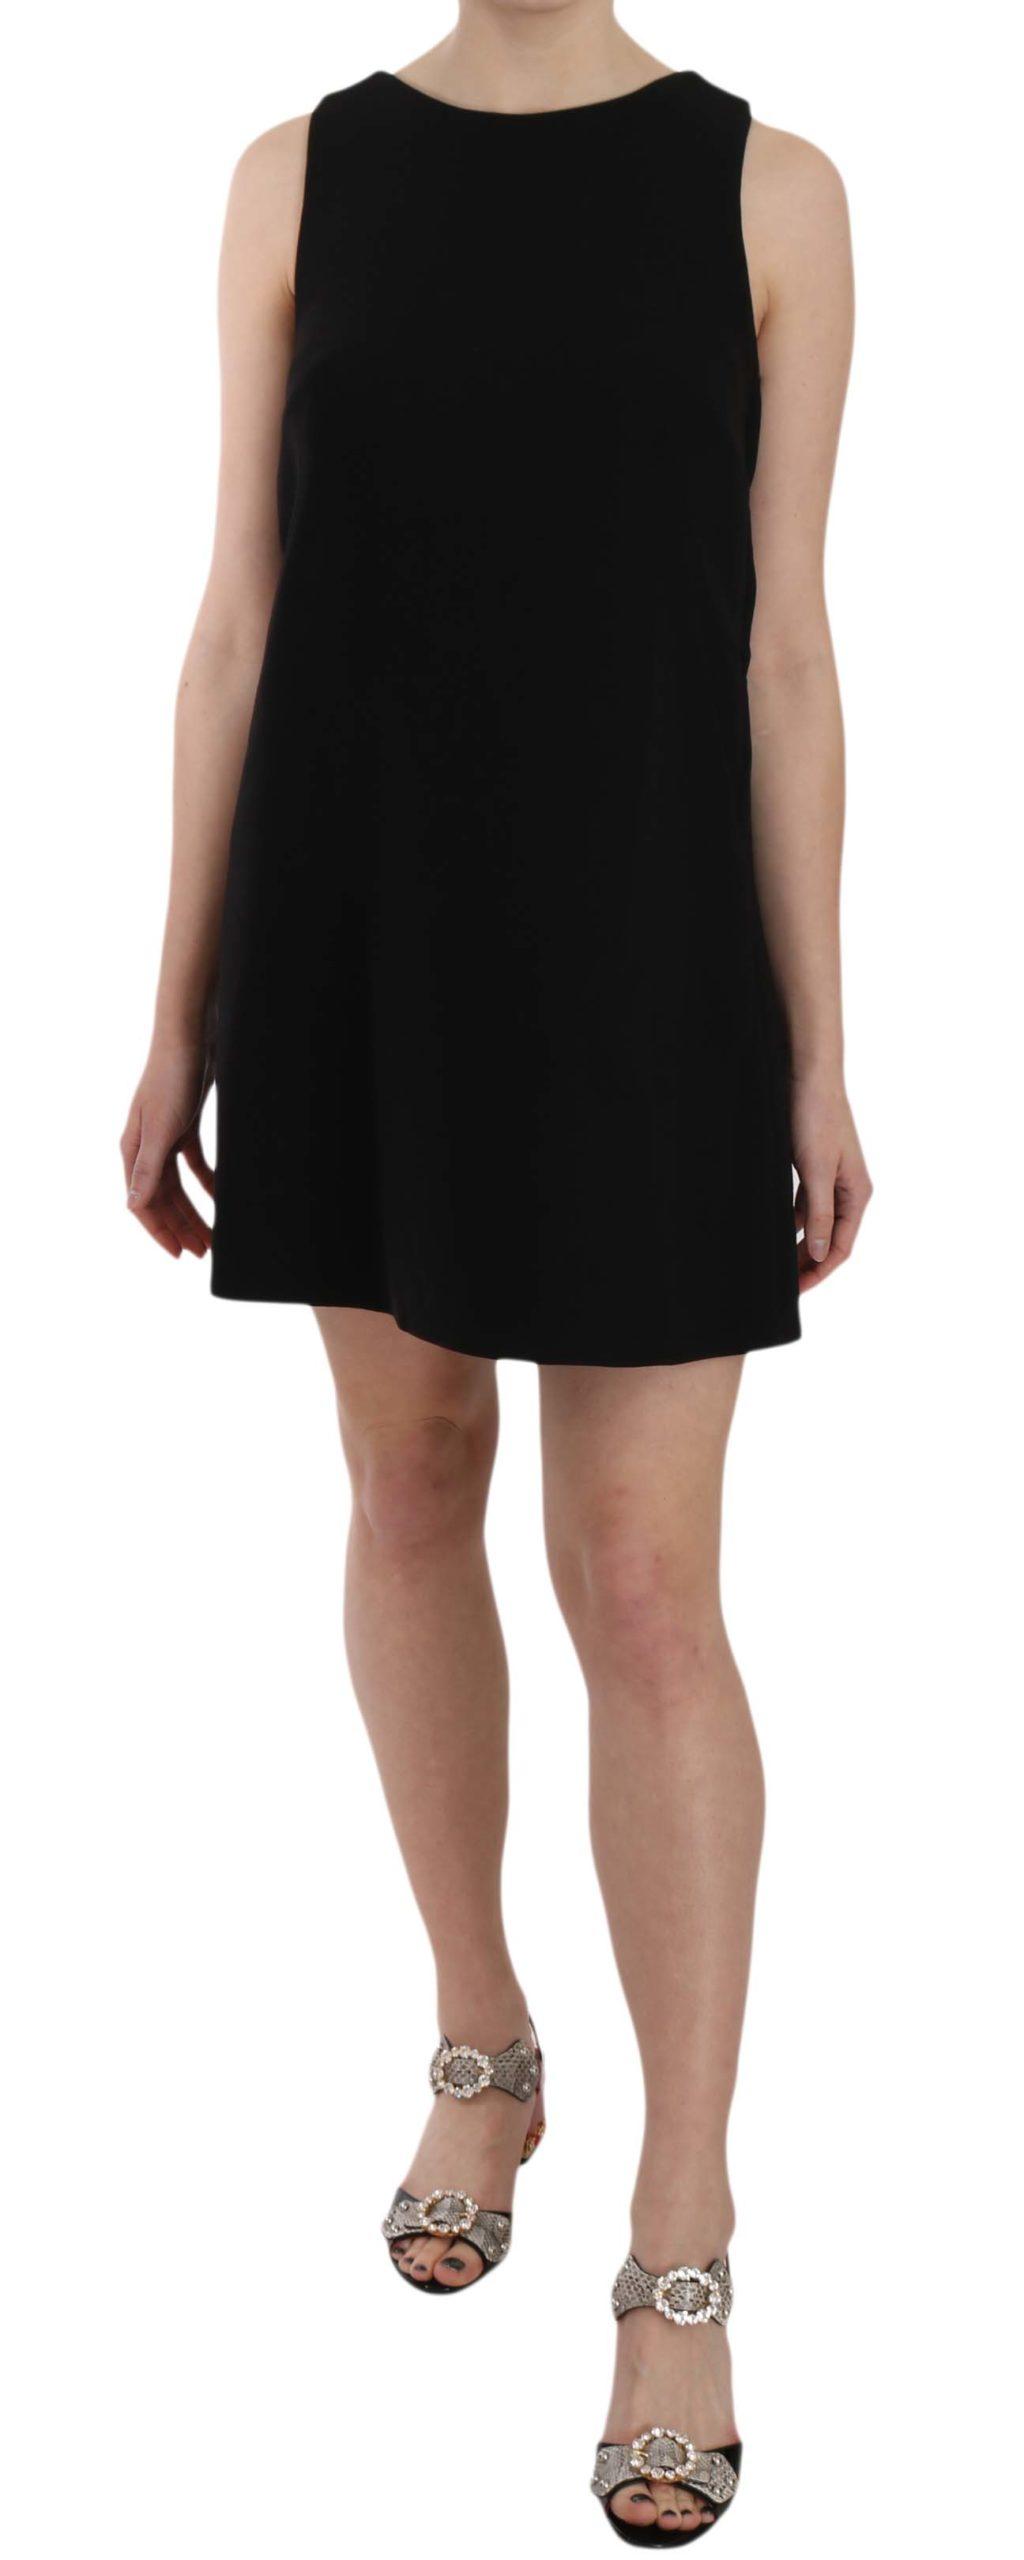 Dolce & Gabbana Women's Wool Crystal Button Shift Dress Black DR1620 - IT38 | S